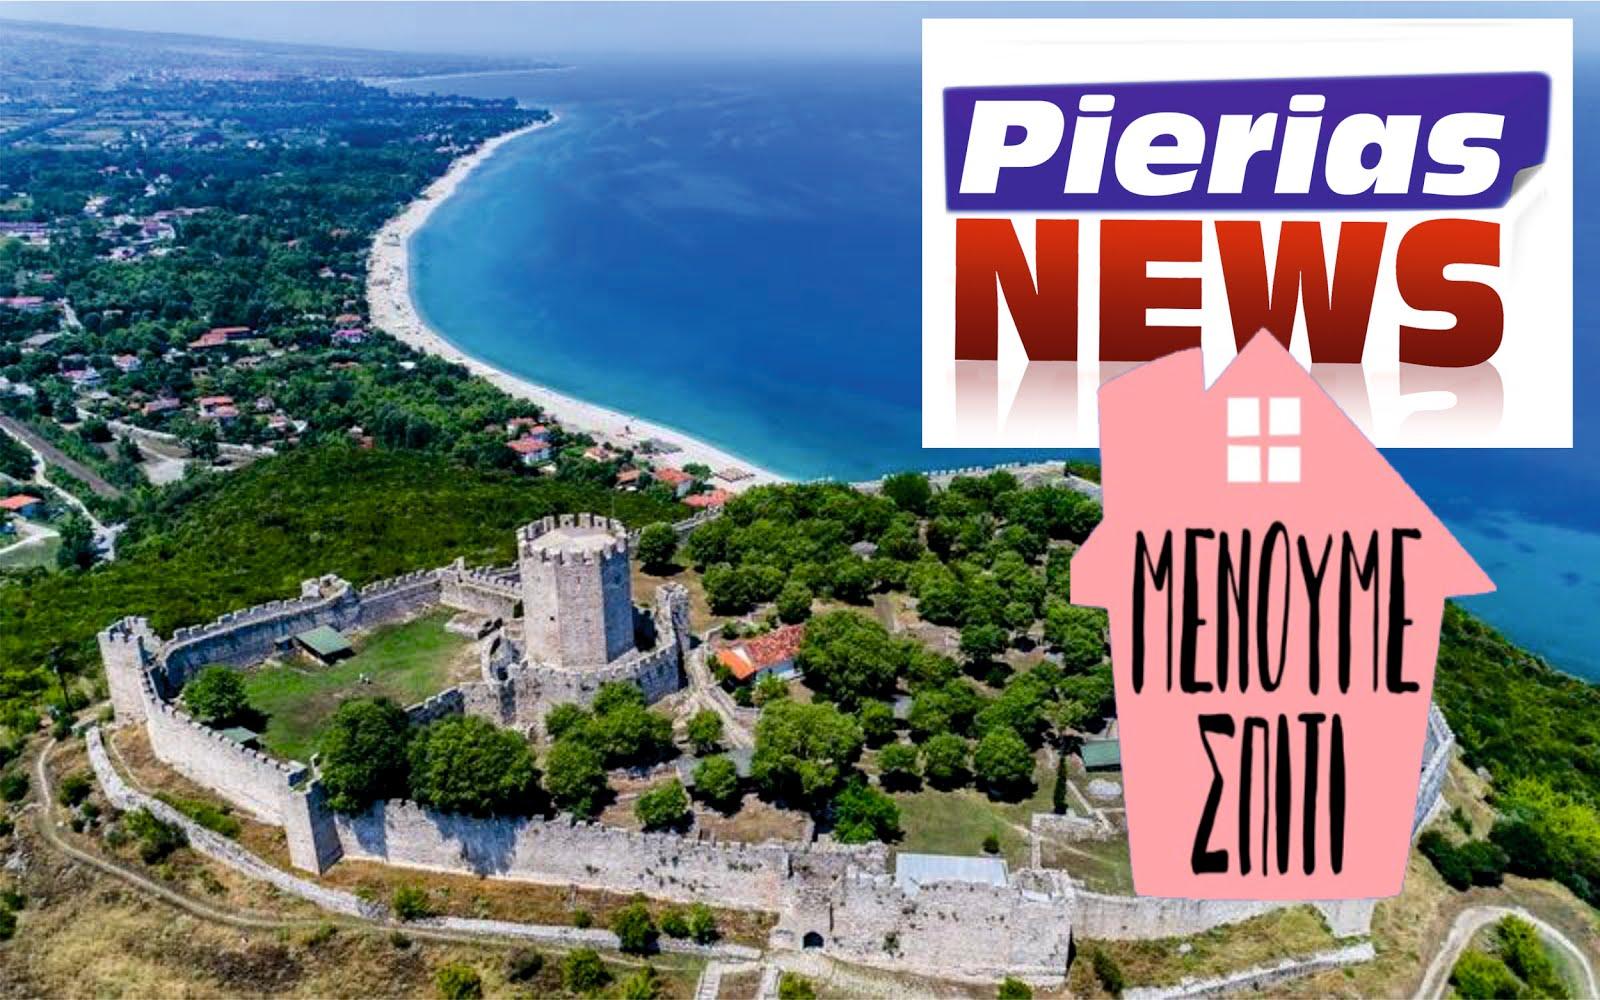 Pierias News - Νεα Πιεριας